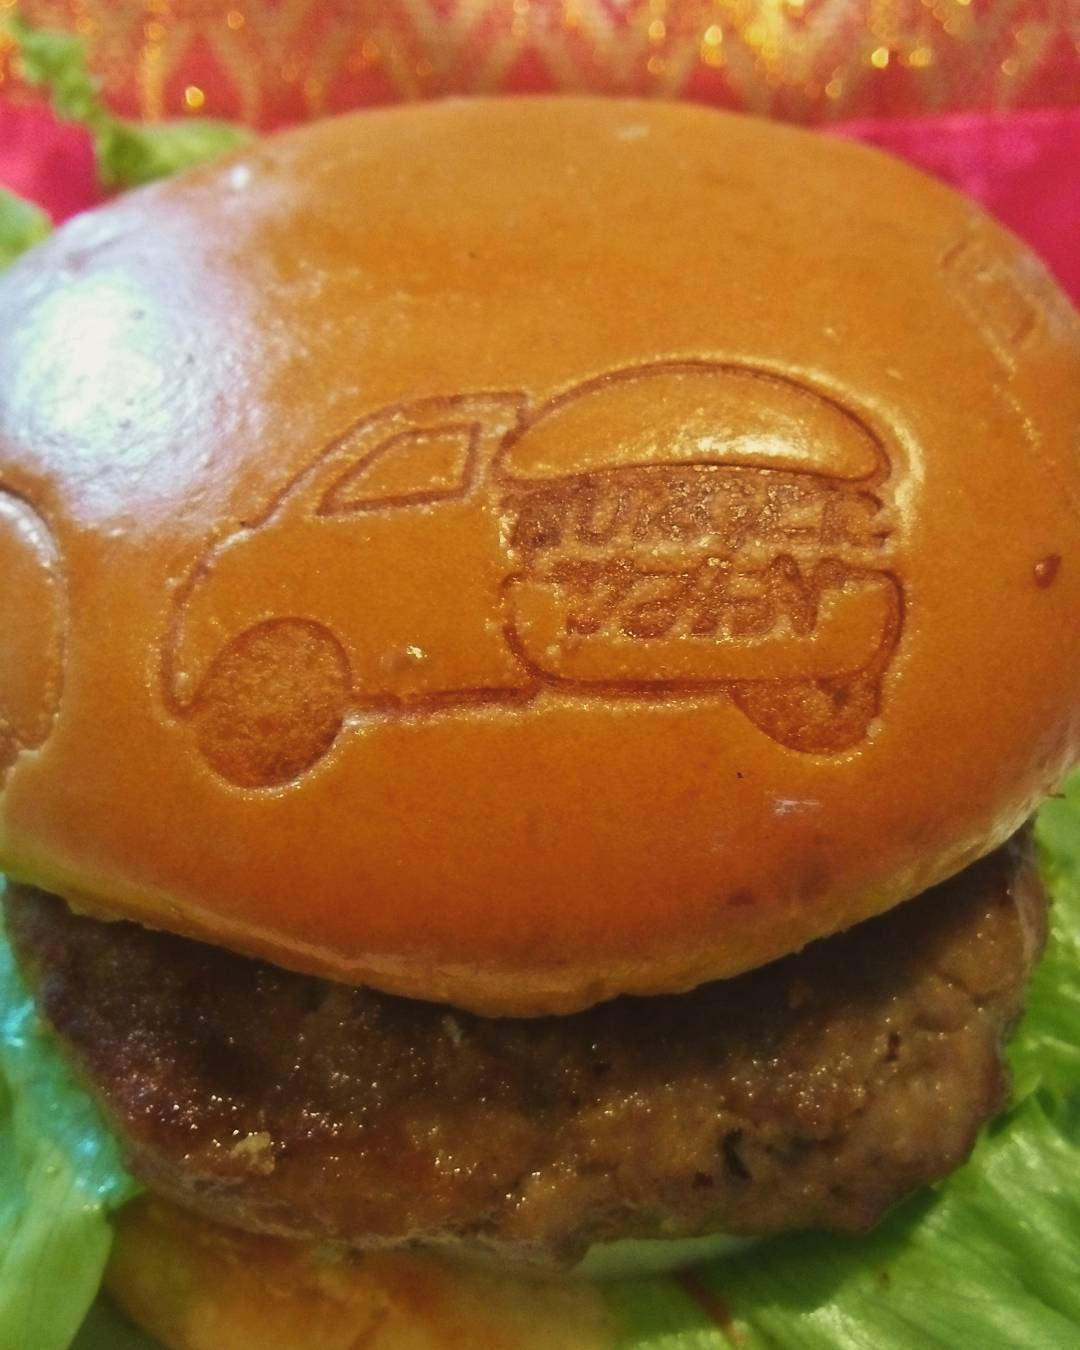 Burger Van Malang, Malang, Kota Malang, Dolan Dolen, Dolaners Burger Van Malang via burgervanmlg - Dolan Dolen